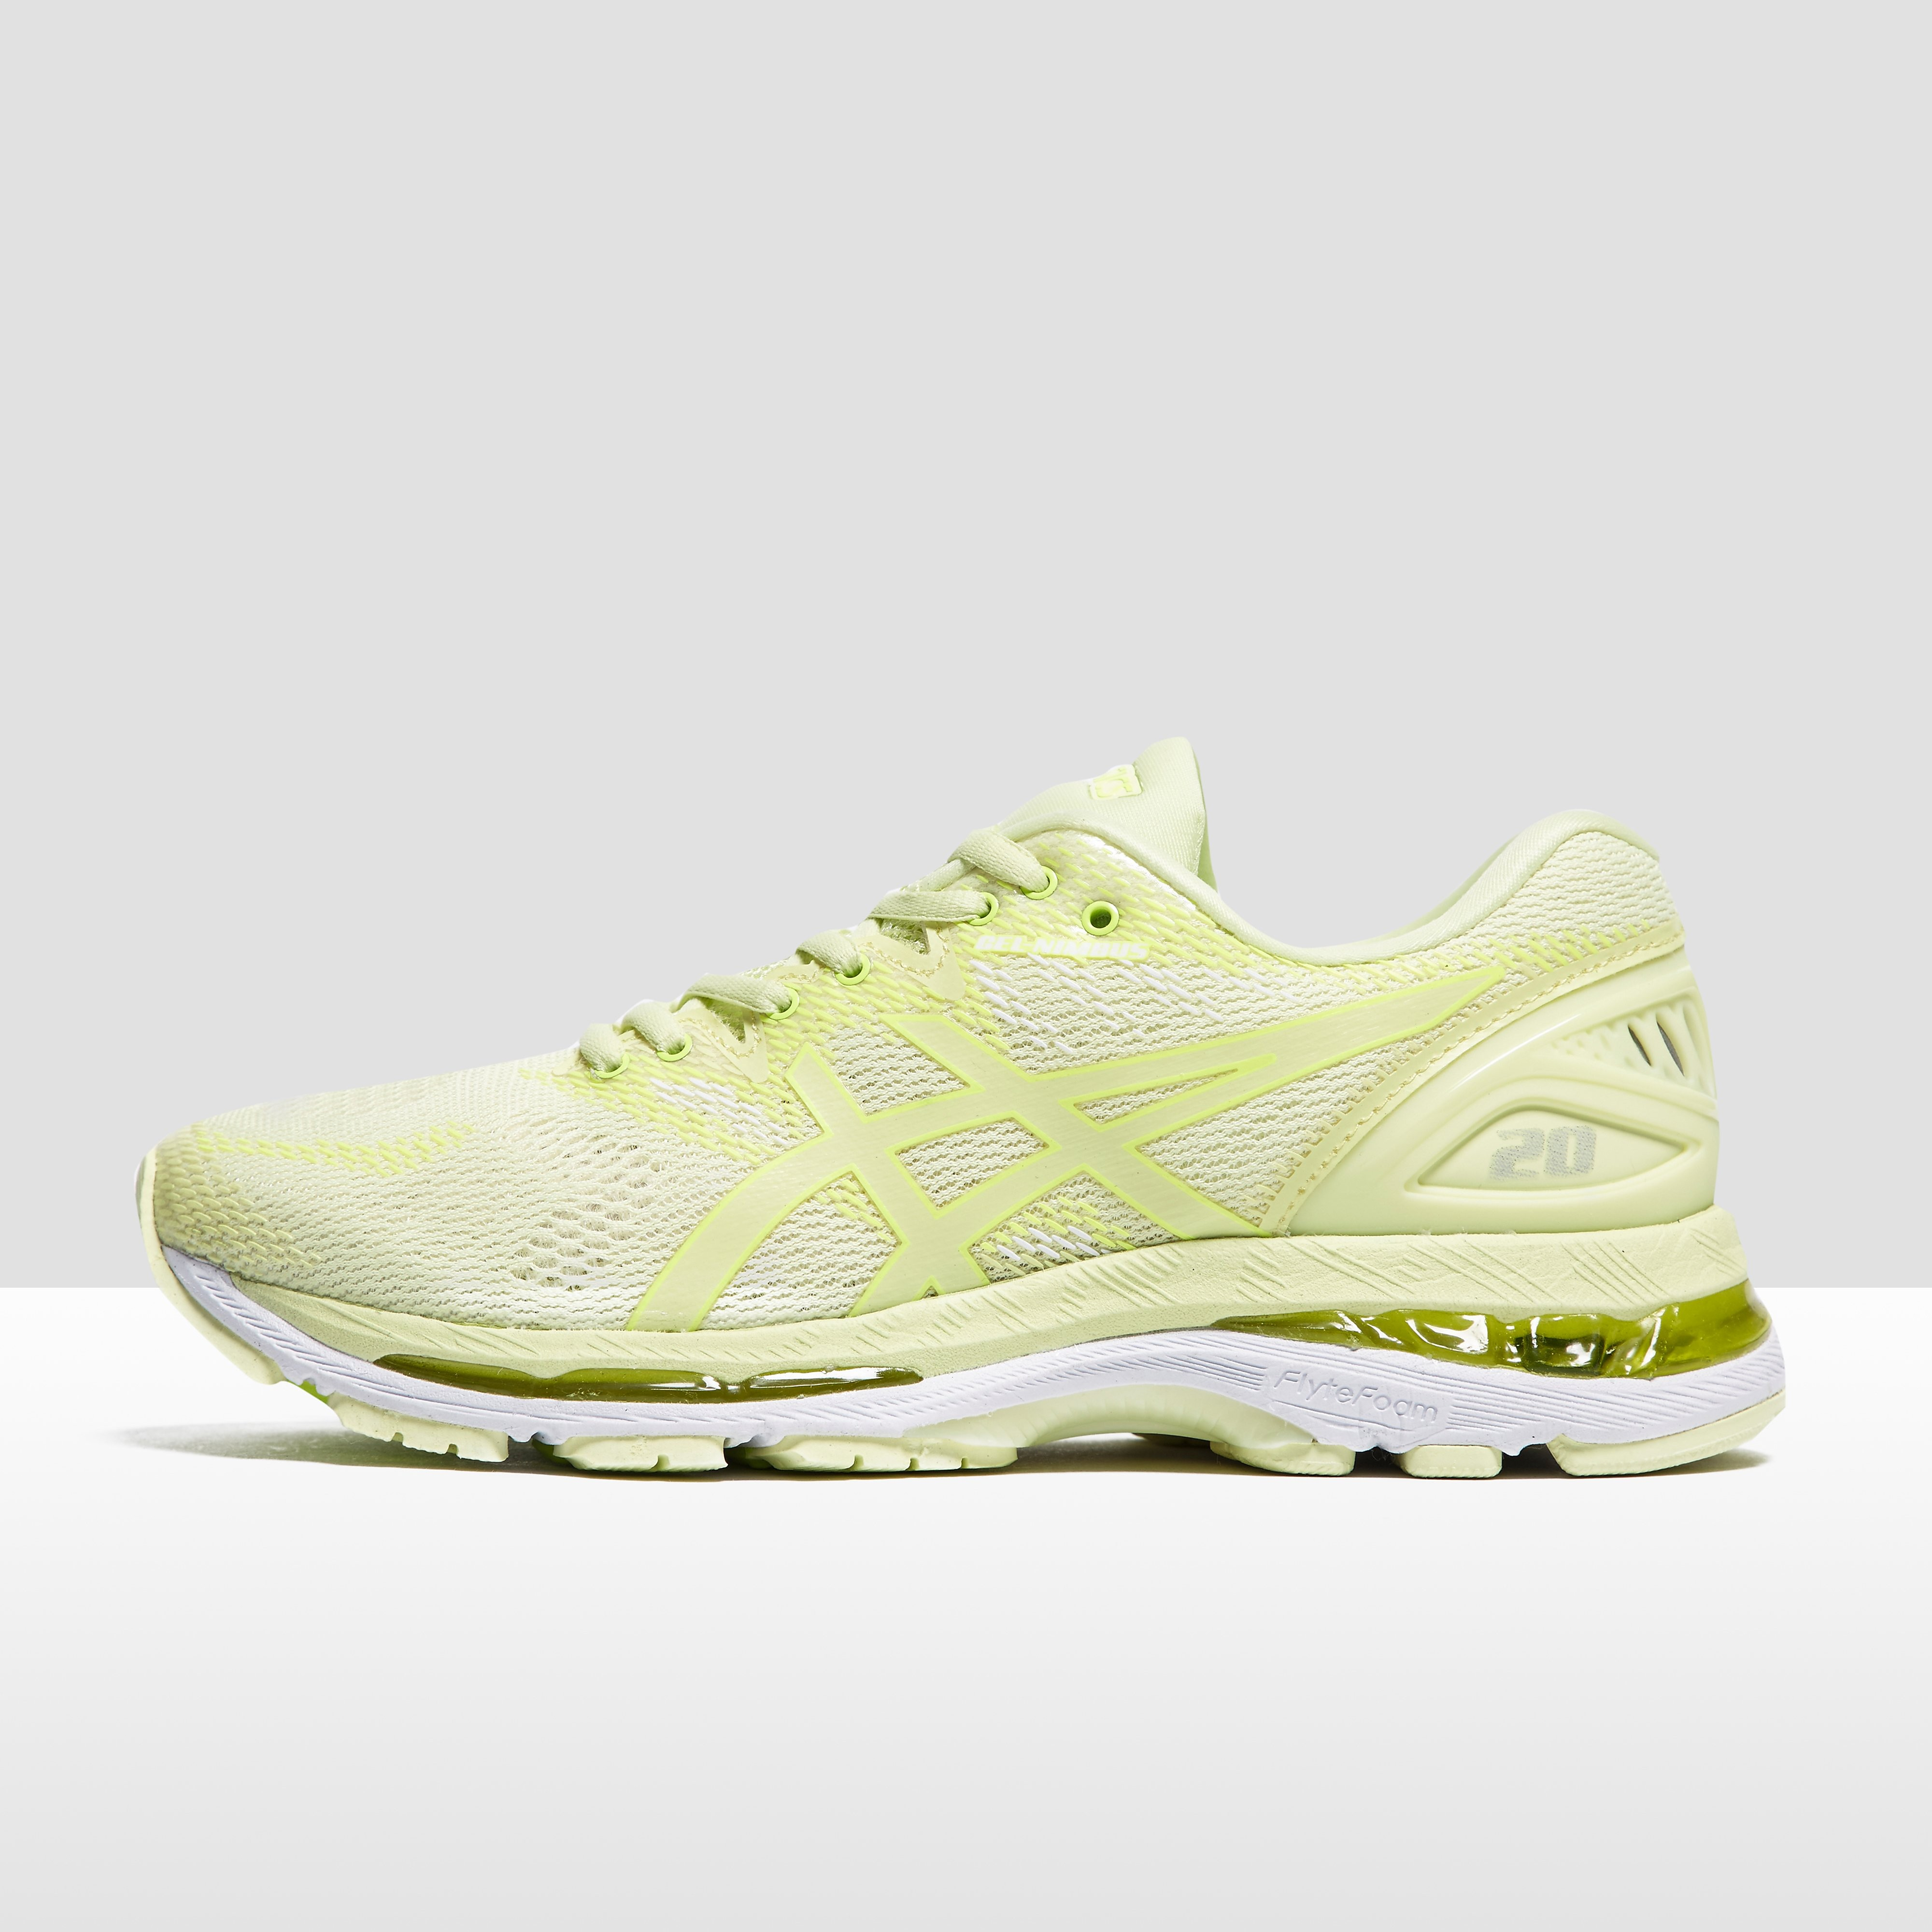 Women's ASICS Gel-Nimbus 20 Running Shoes - Yellow, Yellow